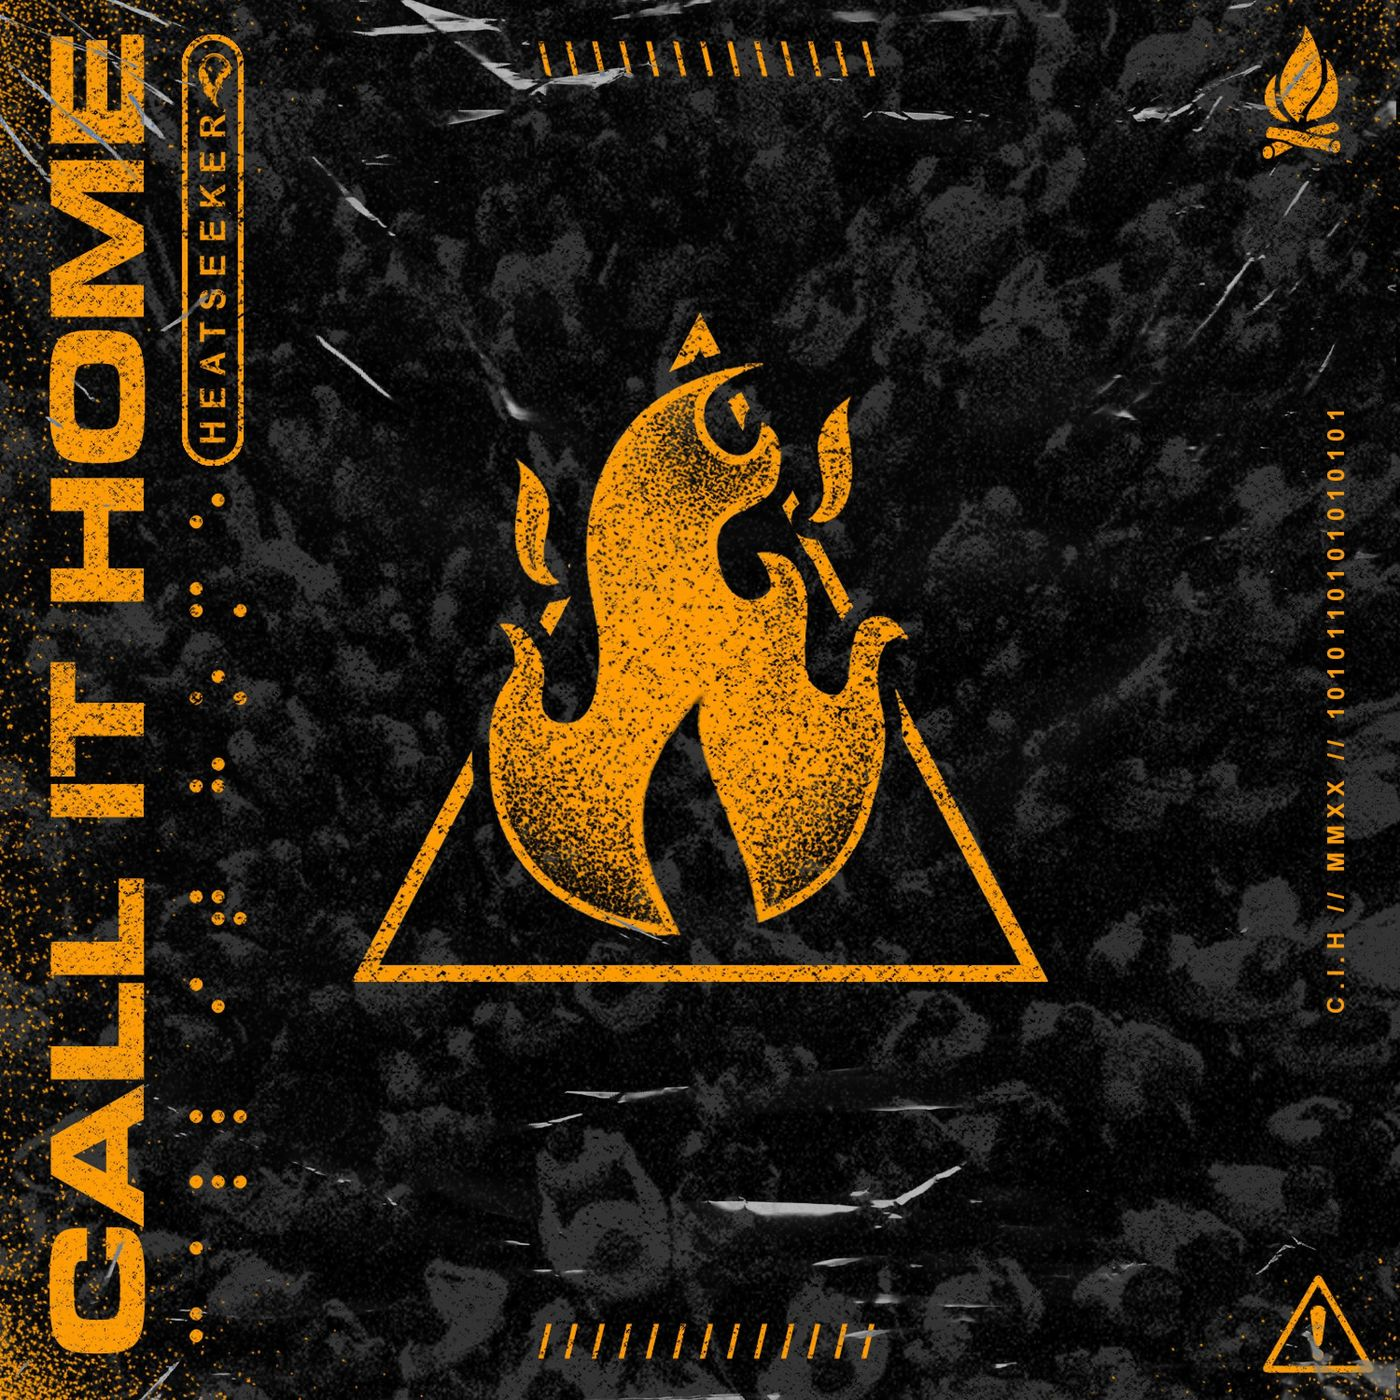 Call It Home - Heatseeker [single] (2020)